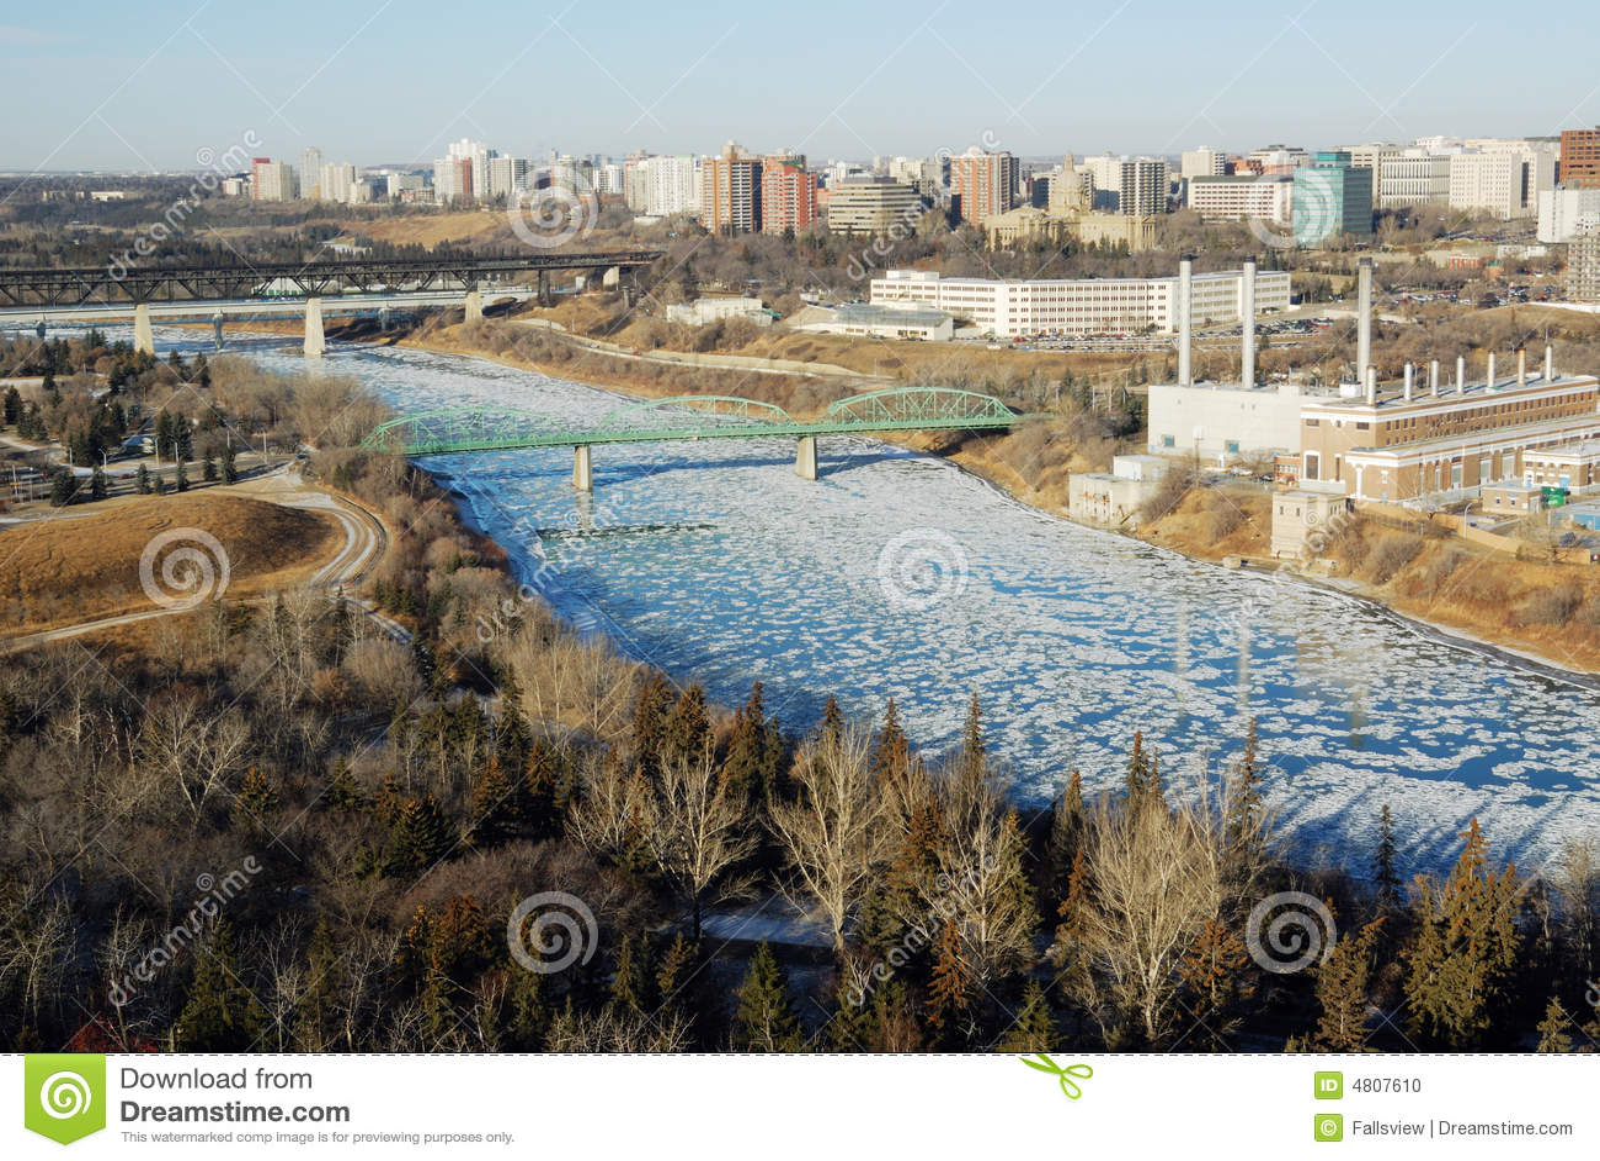 Winter River Valley View In Edmonton Stock Photo